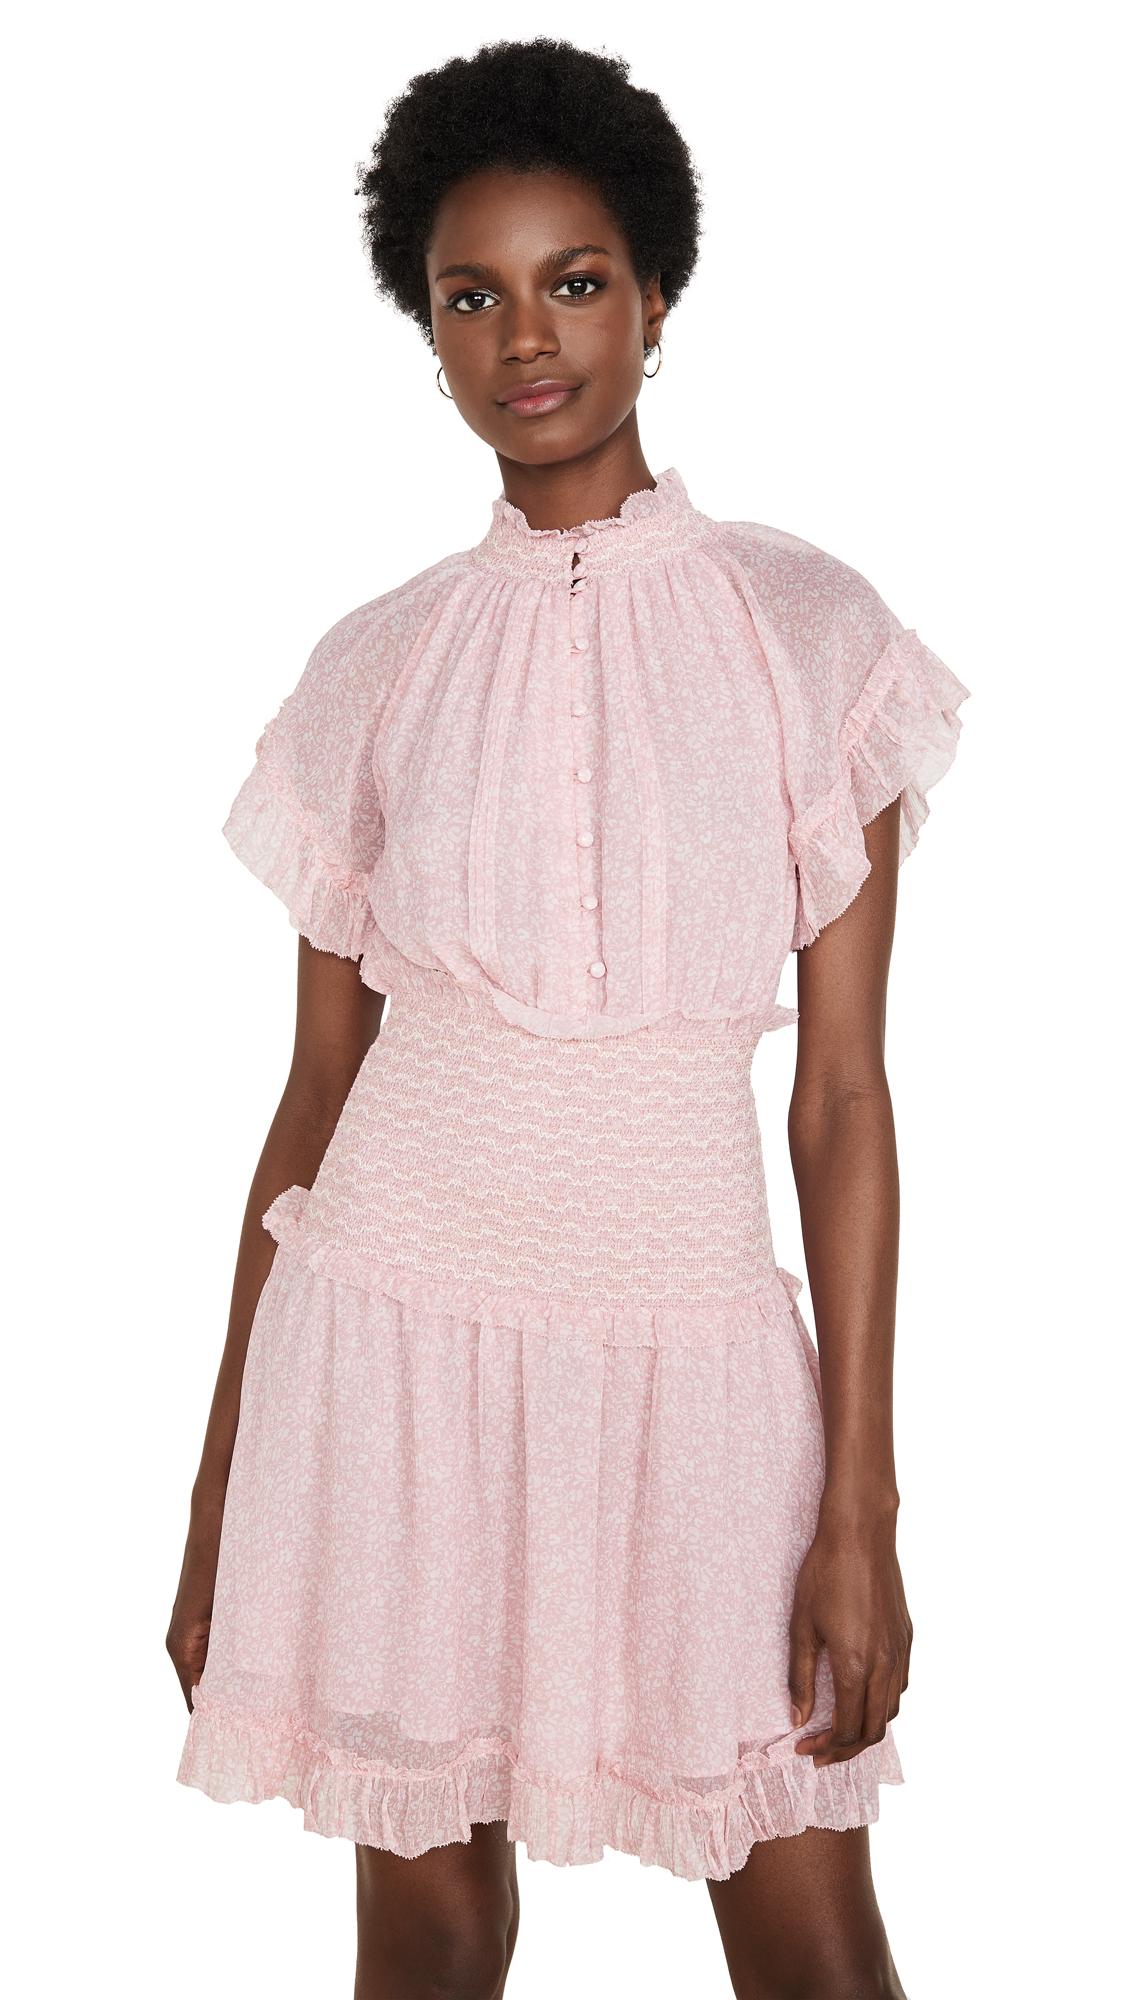 Jonathan Simkhai Serena Floral Crinkle Chiffon Dress - 30% Off Sale